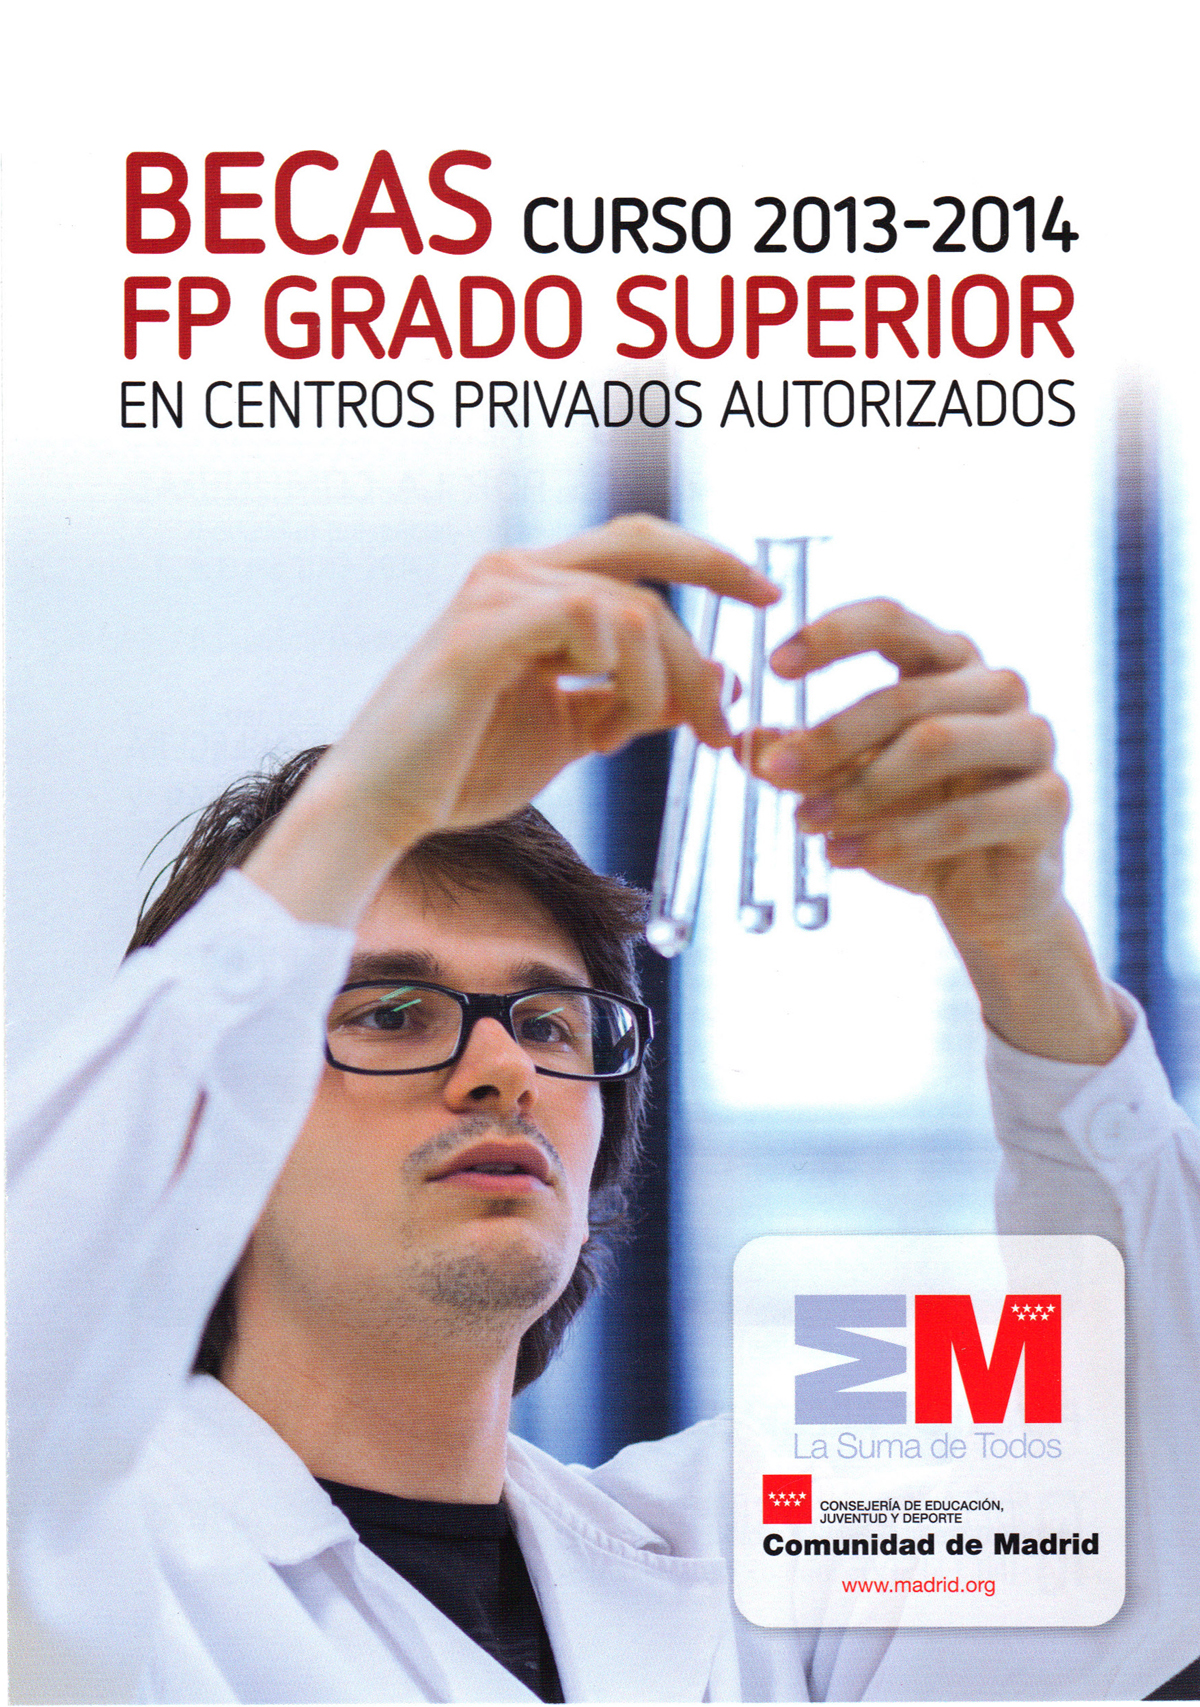 http://elblogdeteidehease.files.wordpress.com/2013/09/folleto1.jpg